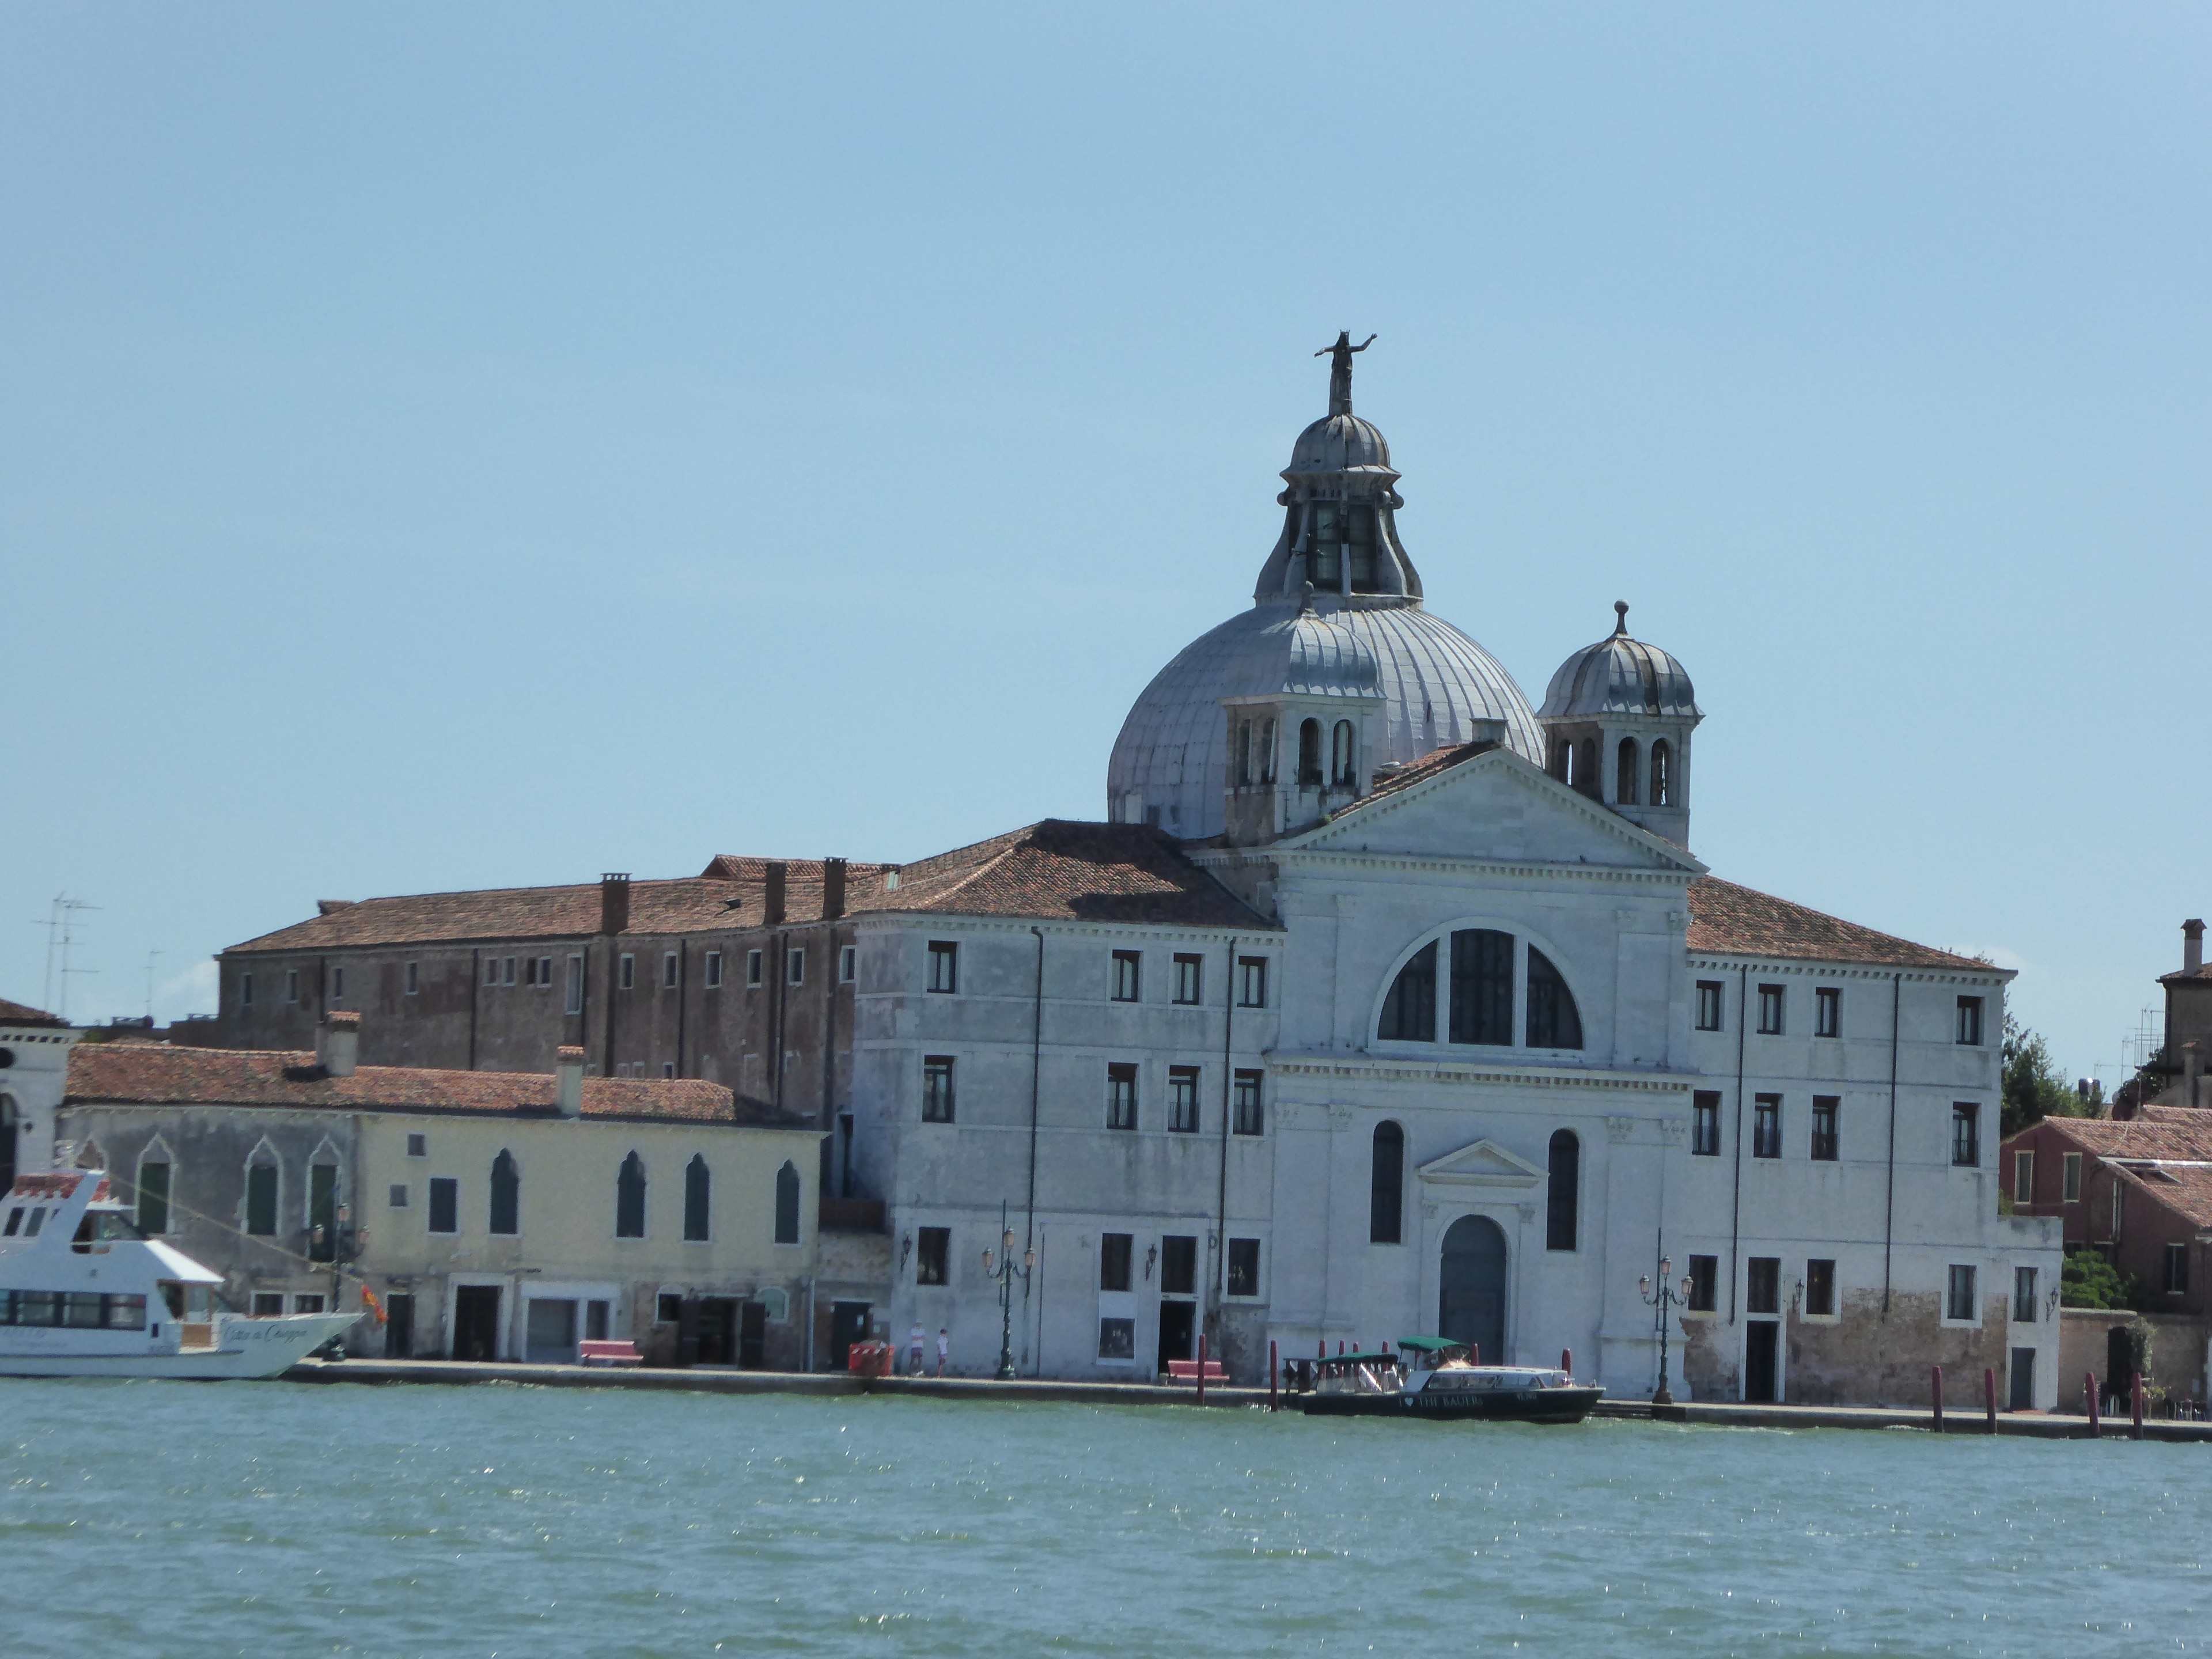 Le Zitelle, Venice, Veneto, Italy